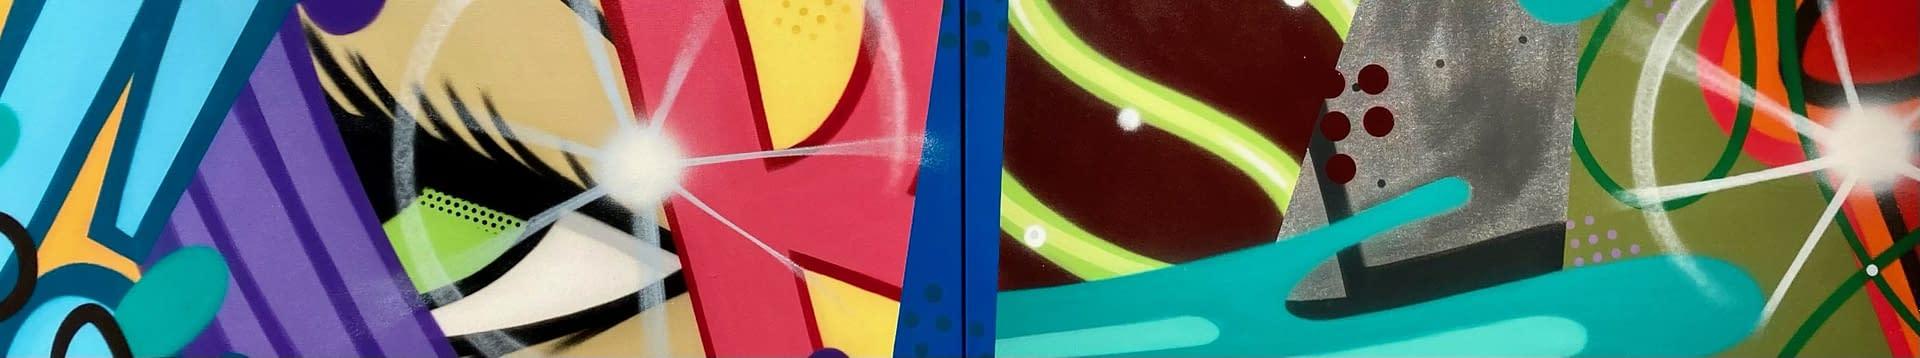 Untitled_Diptych_John_CRASH_Matos_Spray_Paint_on_Canvas_16_x_80